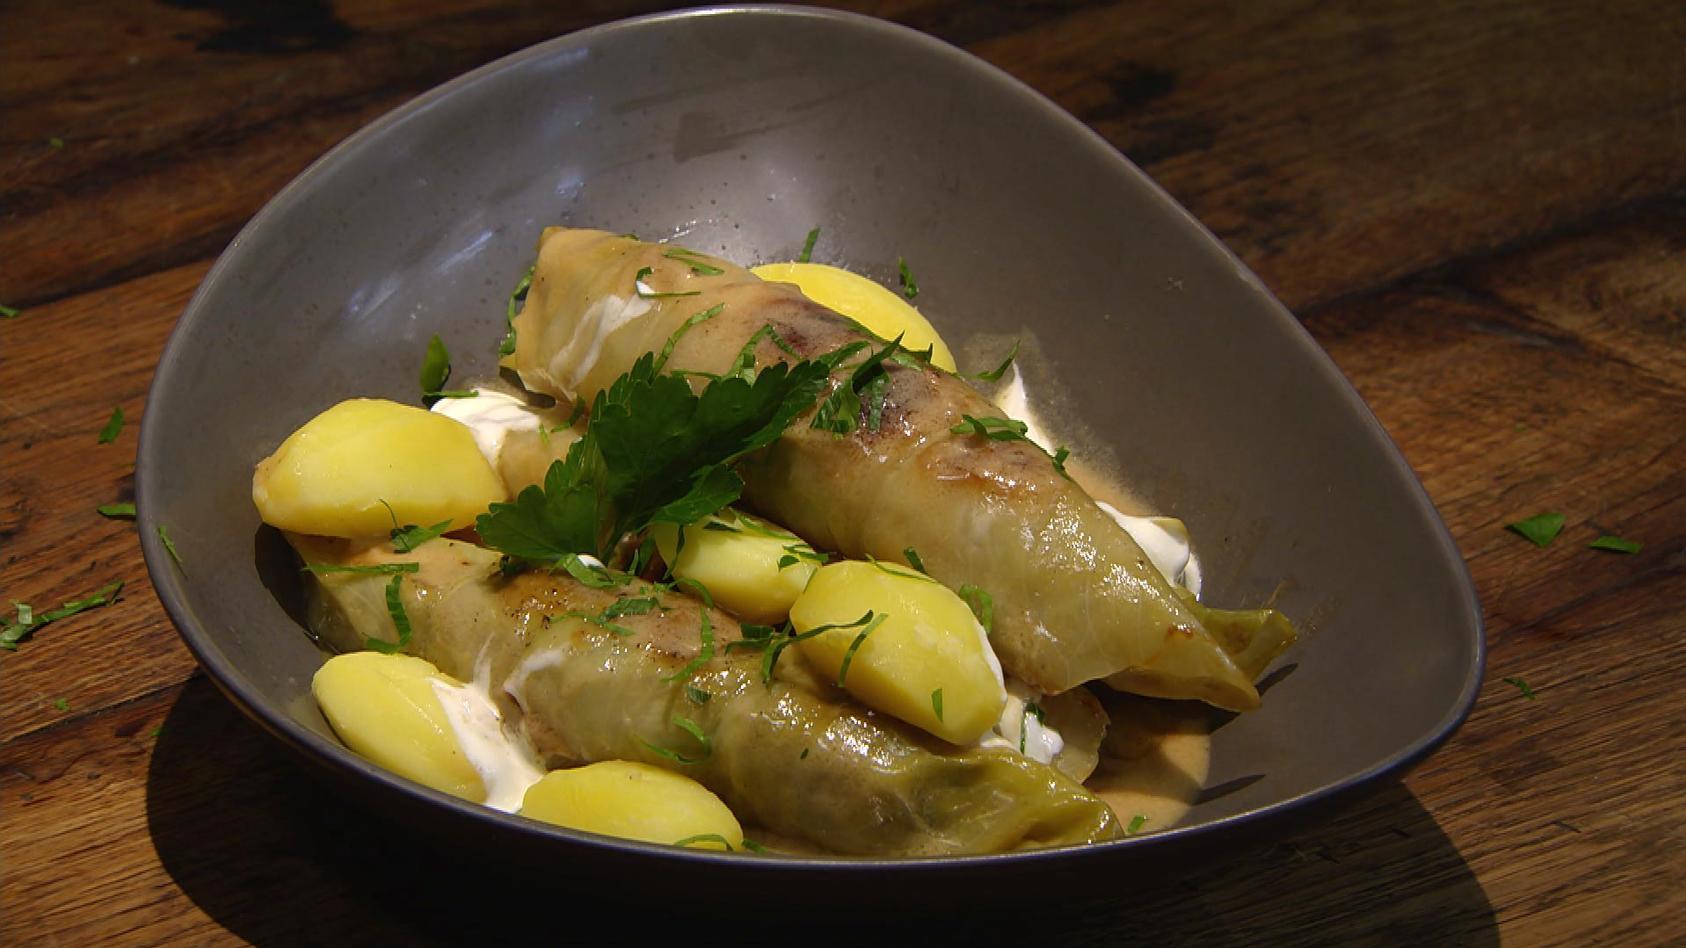 Knackiger Kohl – Satt mit dem Allrounder-Gemüse: Kohlrouladen mit Salzkartoffeln